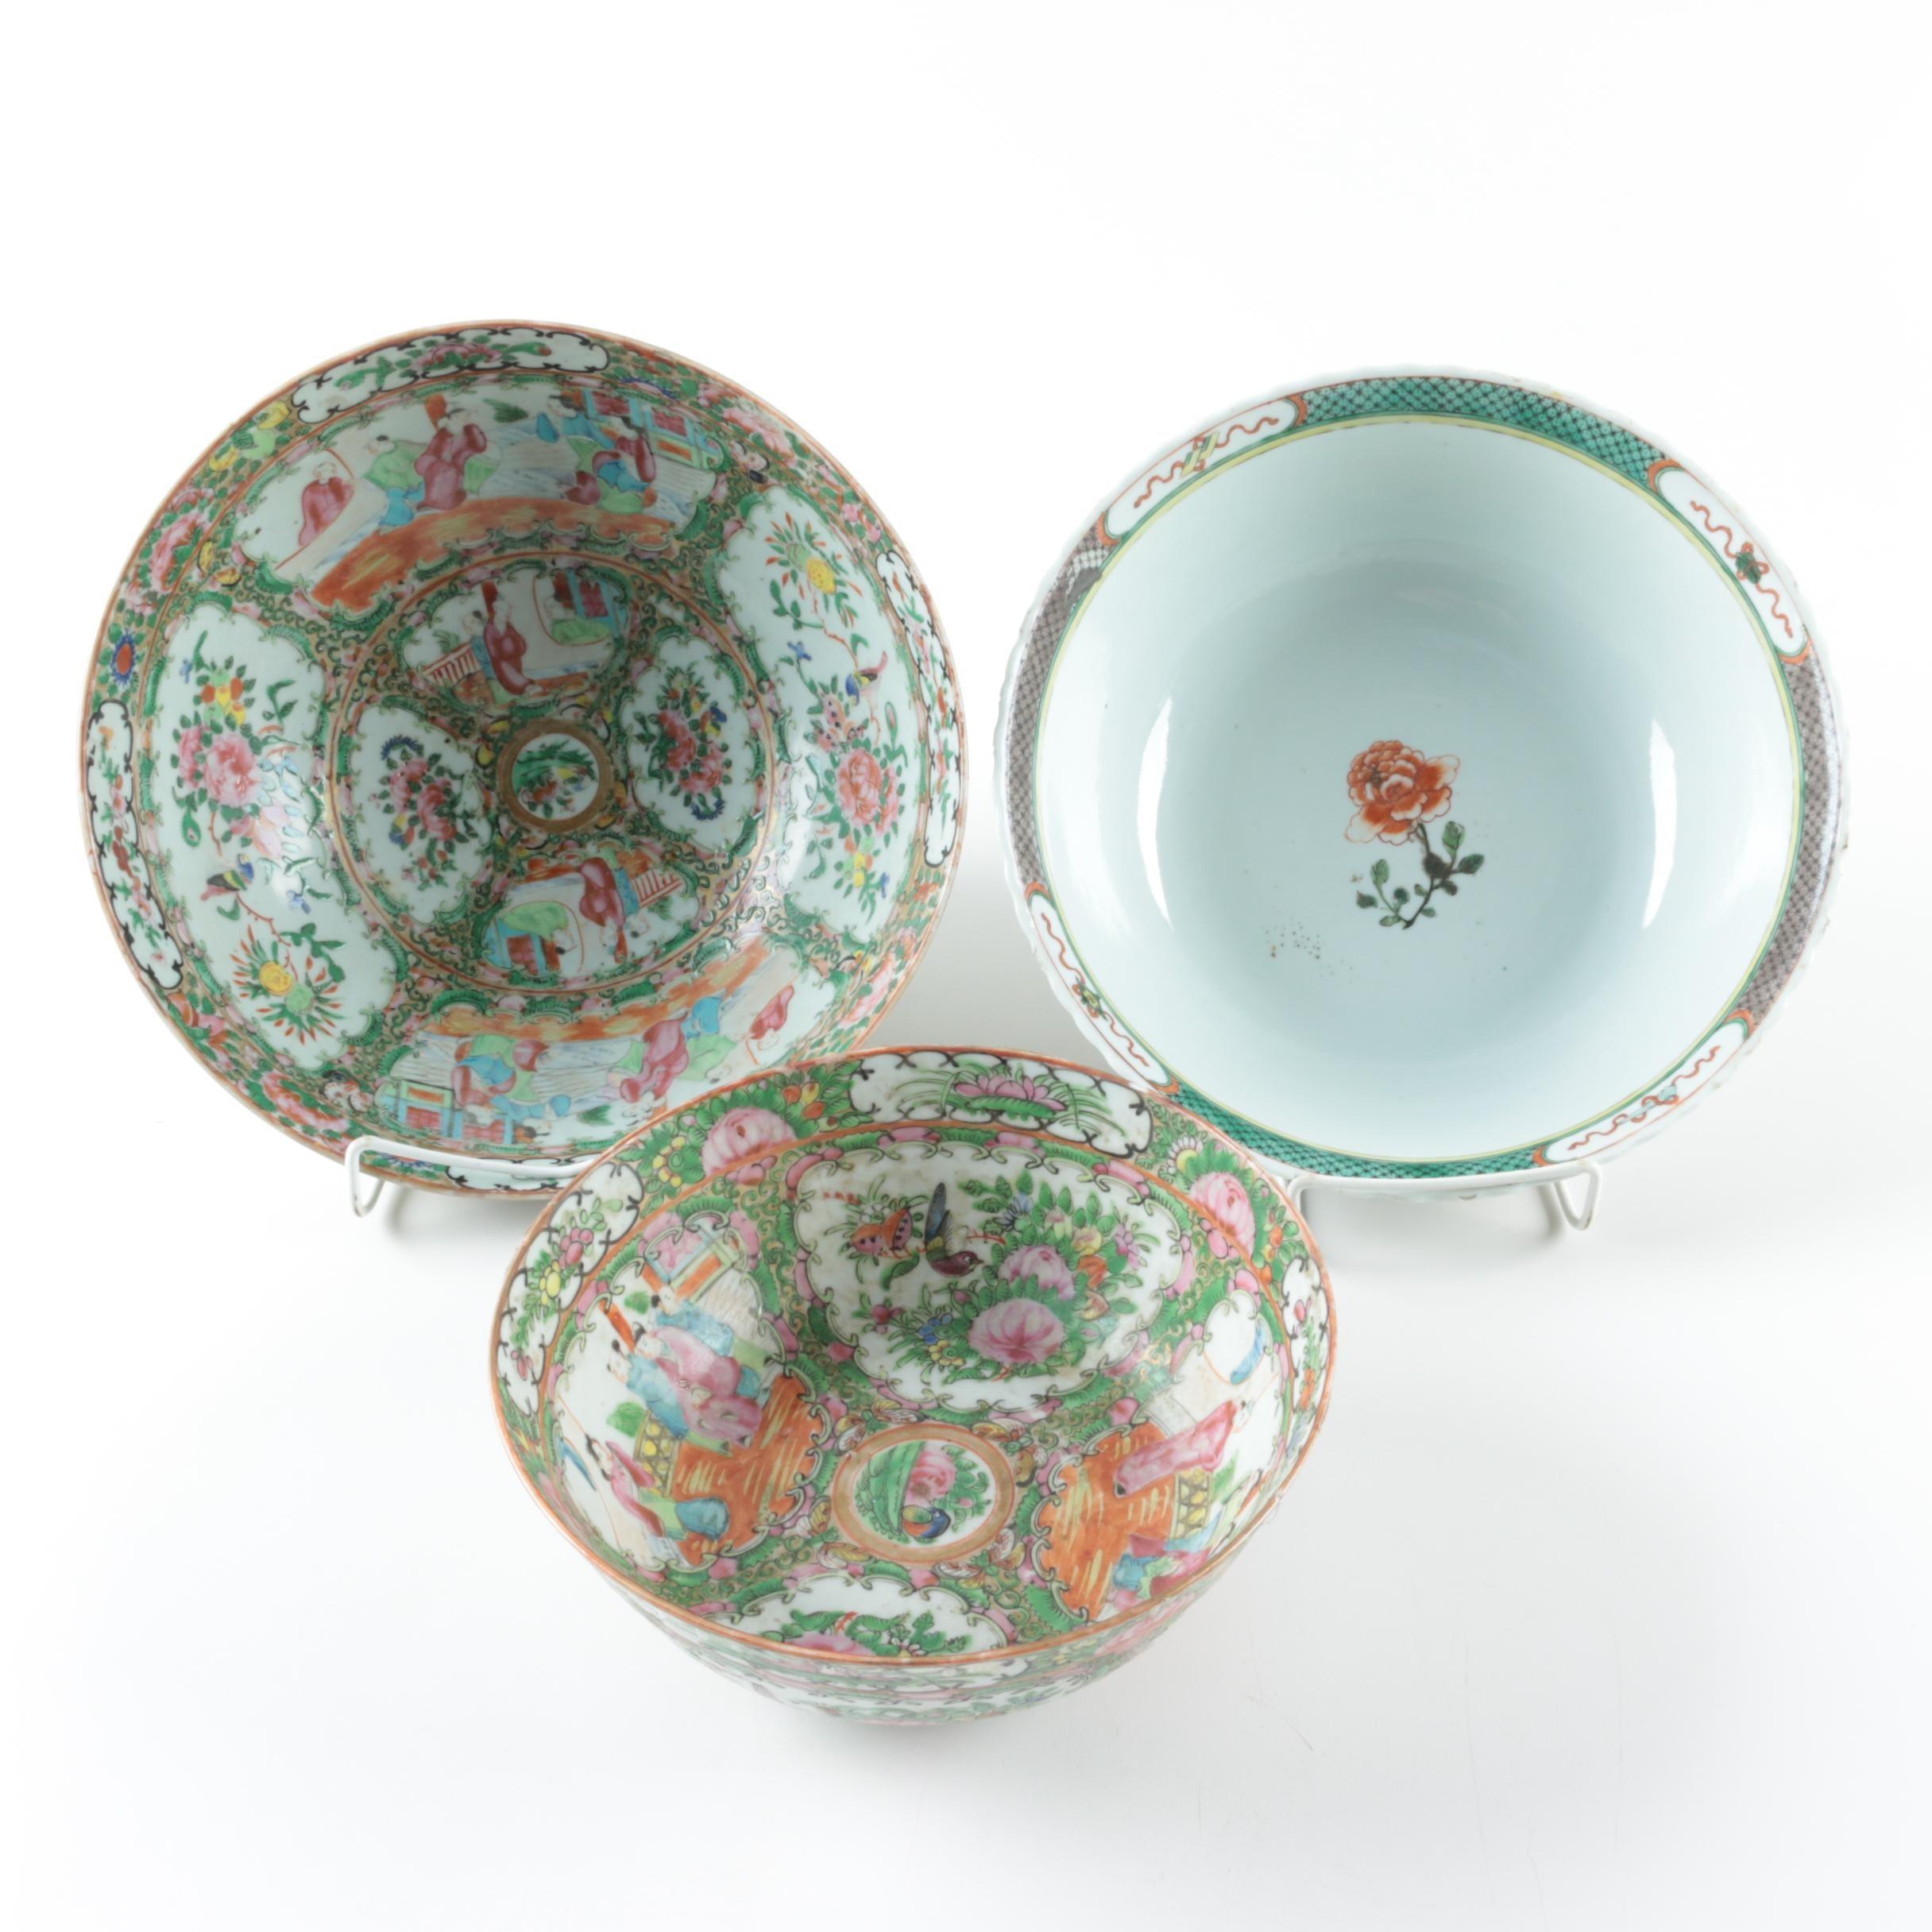 Chinese Rose Medallion Porcelain Bowls